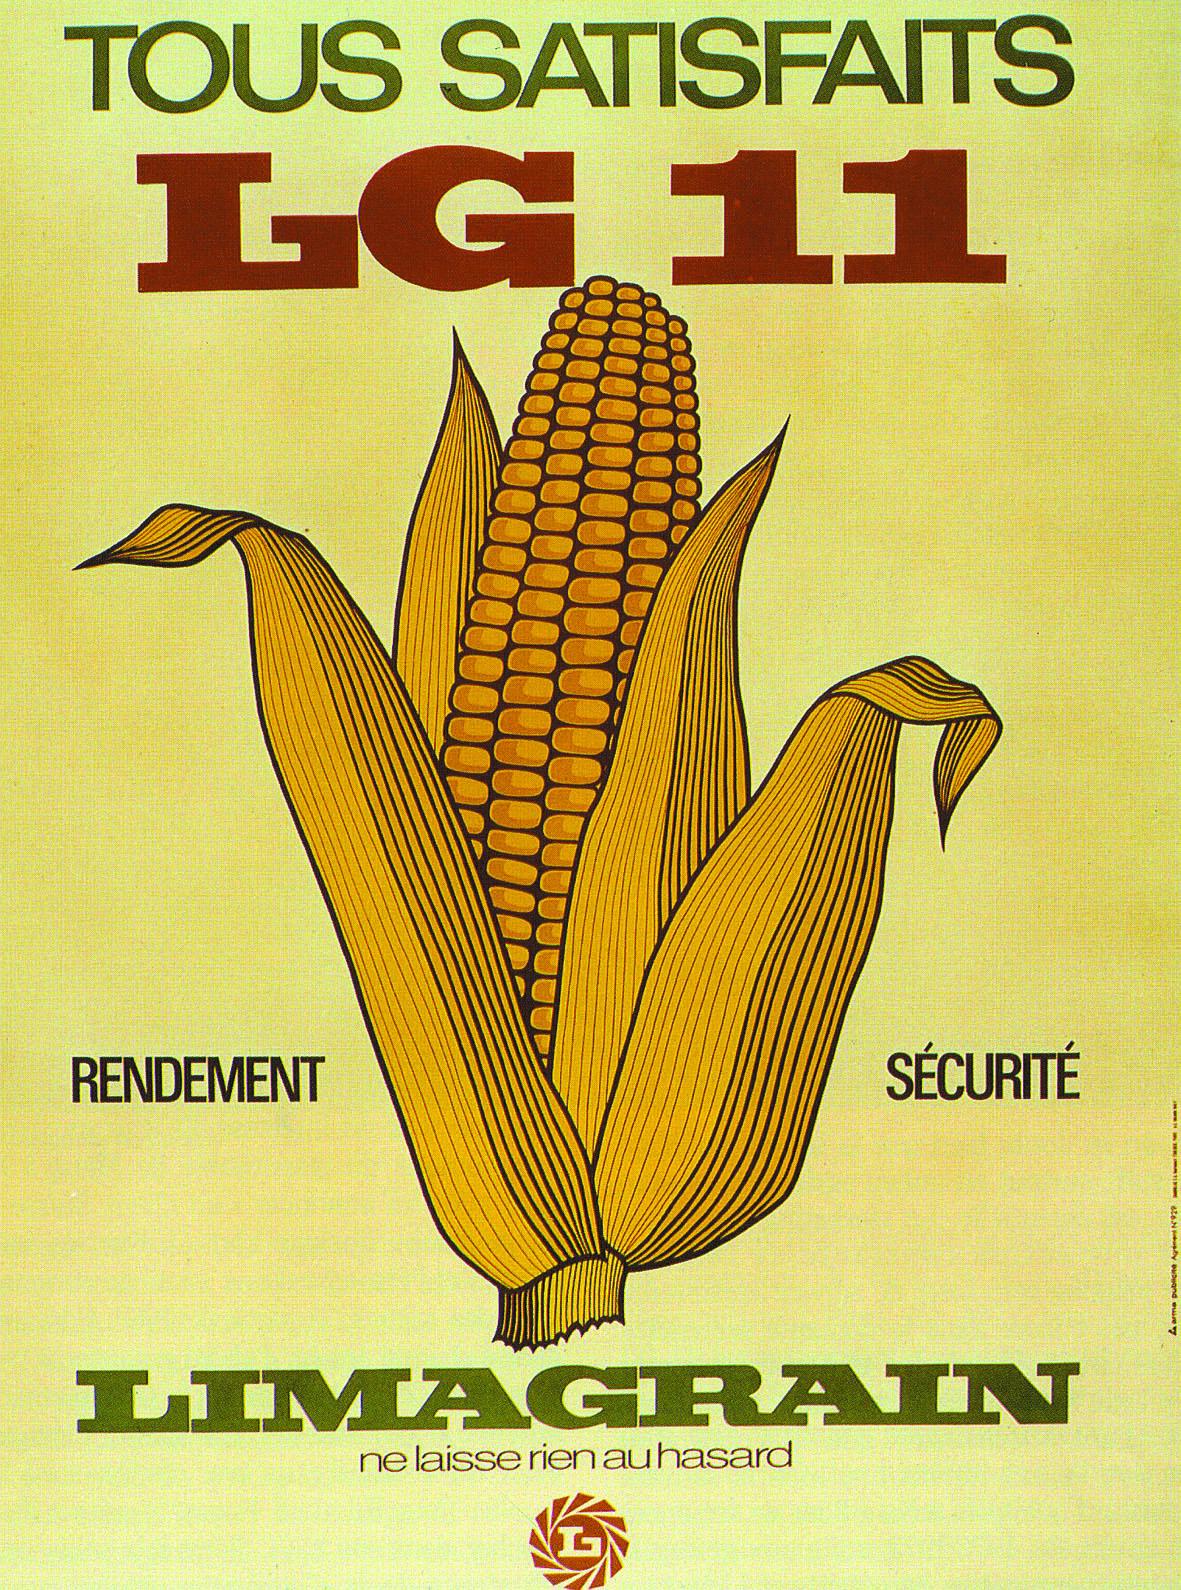 1965 - 80